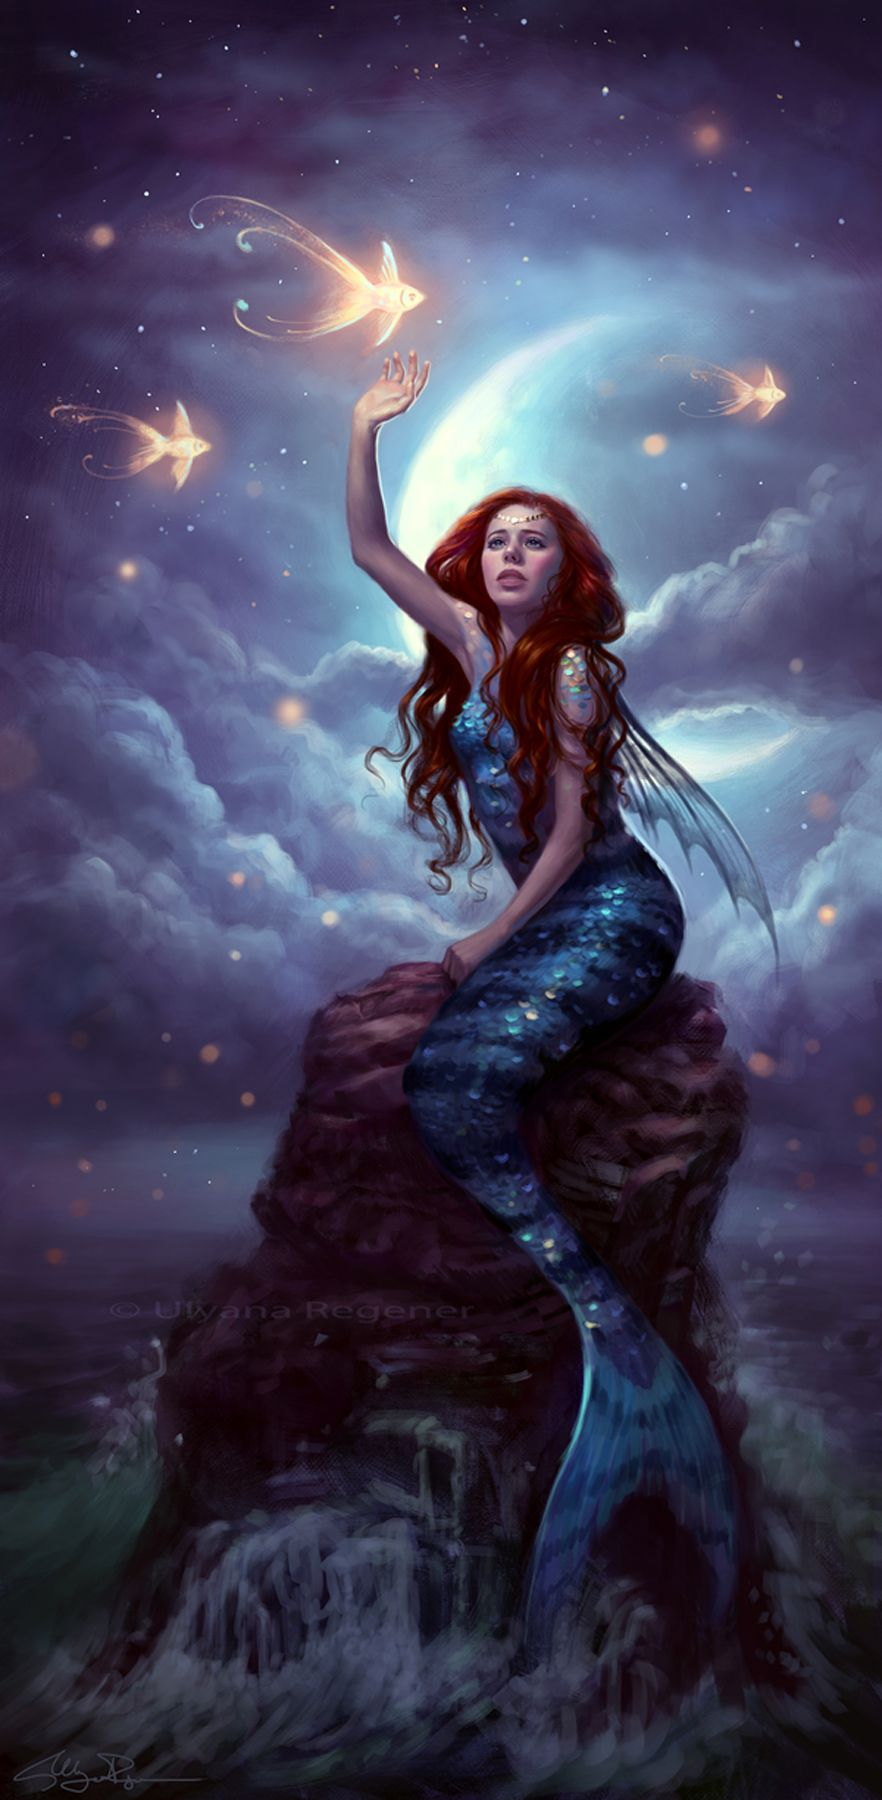 Fantasy Meerjungfrau